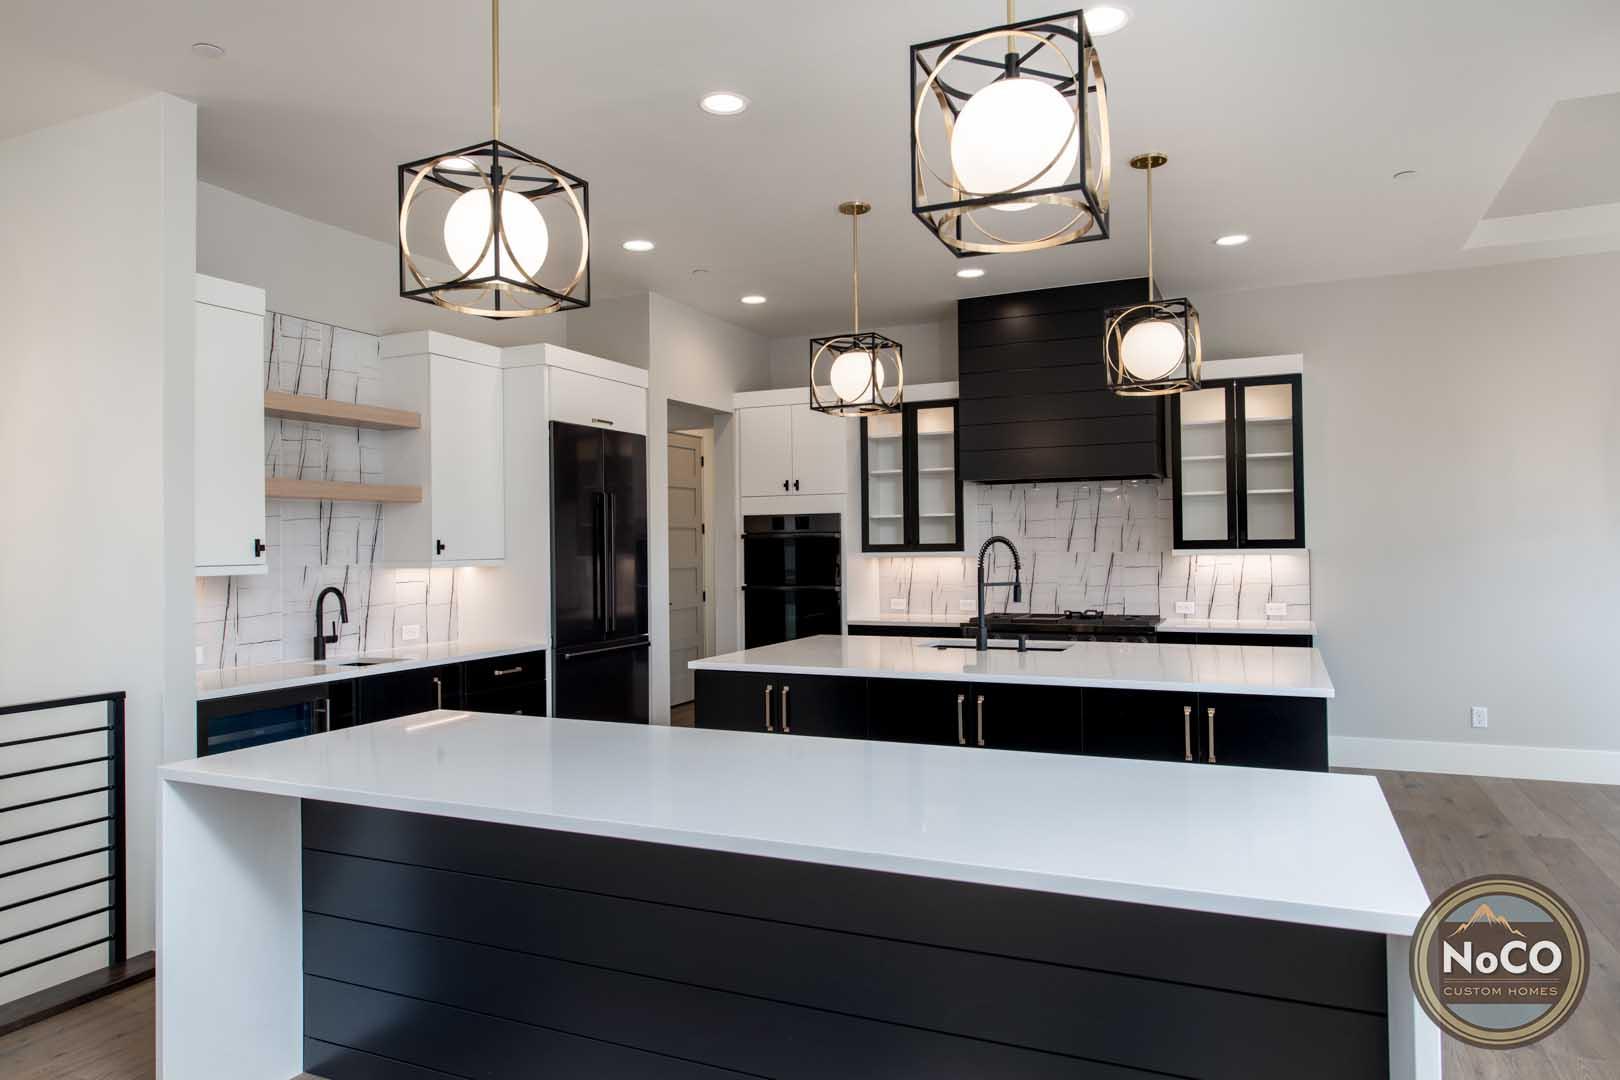 double kitchen islands colorado custom home